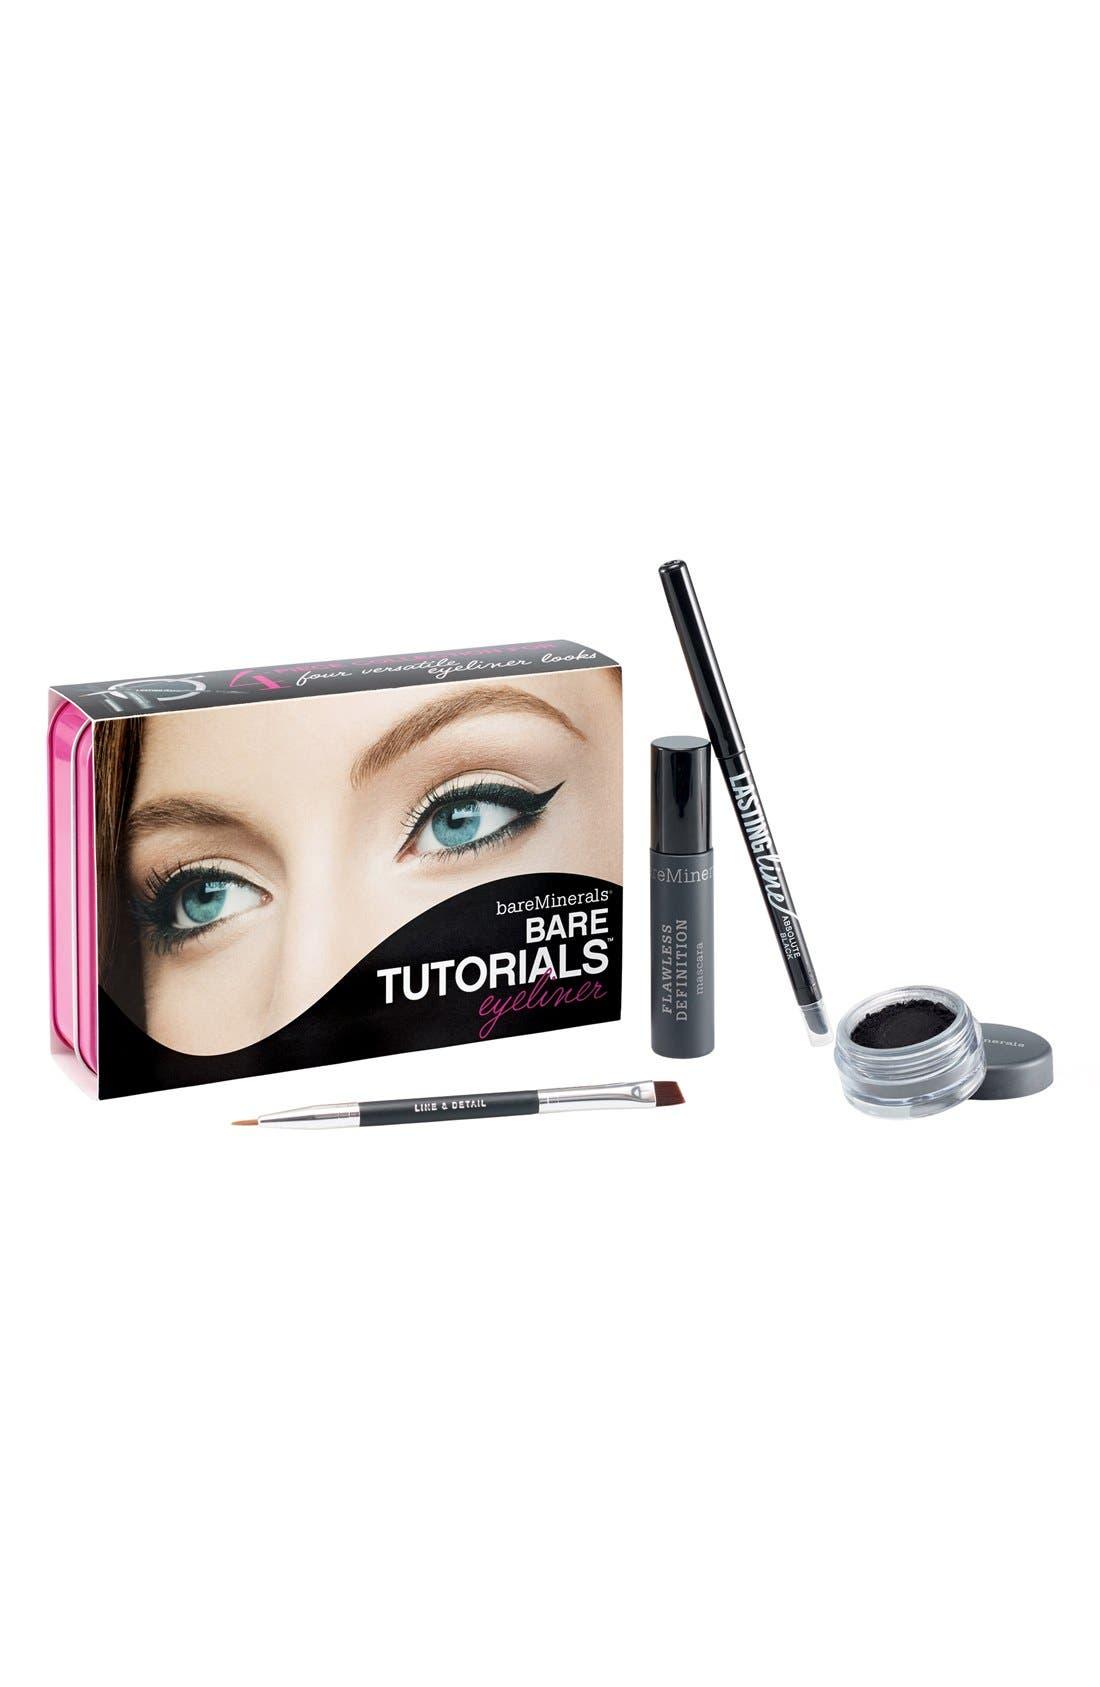 bareMinerals® Bare Tutorials Eyeliner Set ($56 Value)